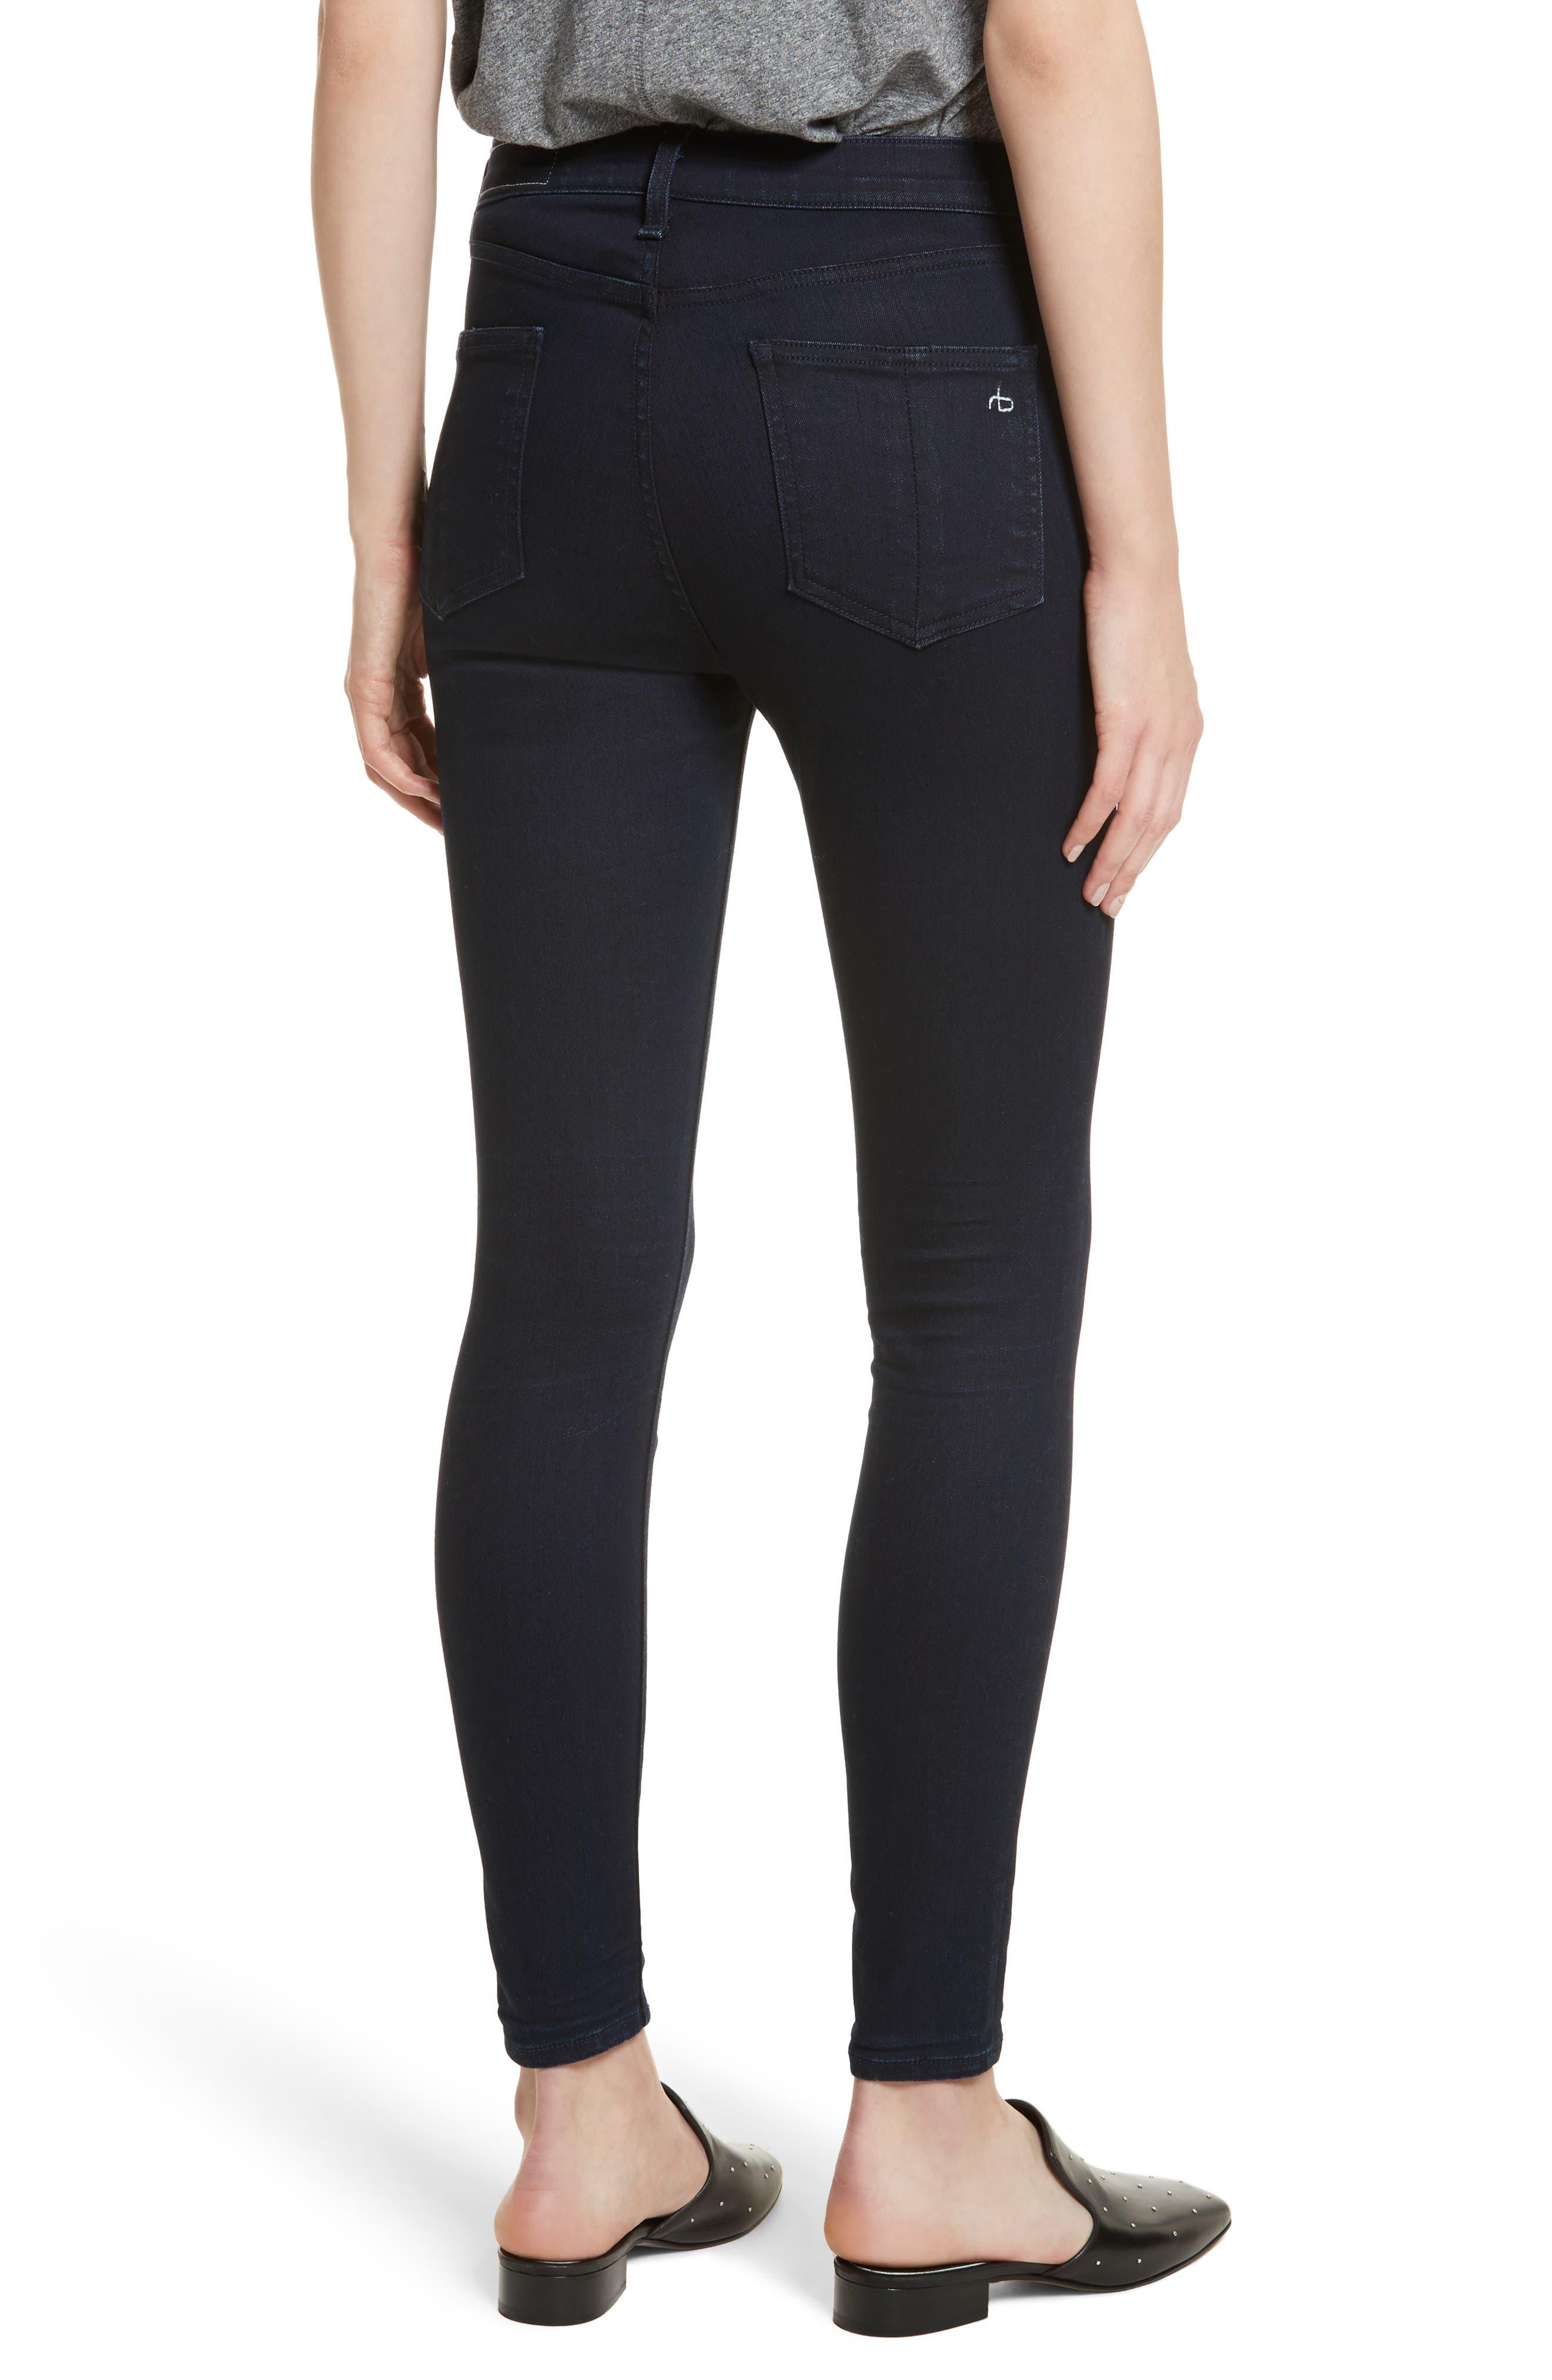 RAG & BONE,                             JEAN High Waist Ankle Skinny Jeans,                             Alternate thumbnail 2, color,                             001